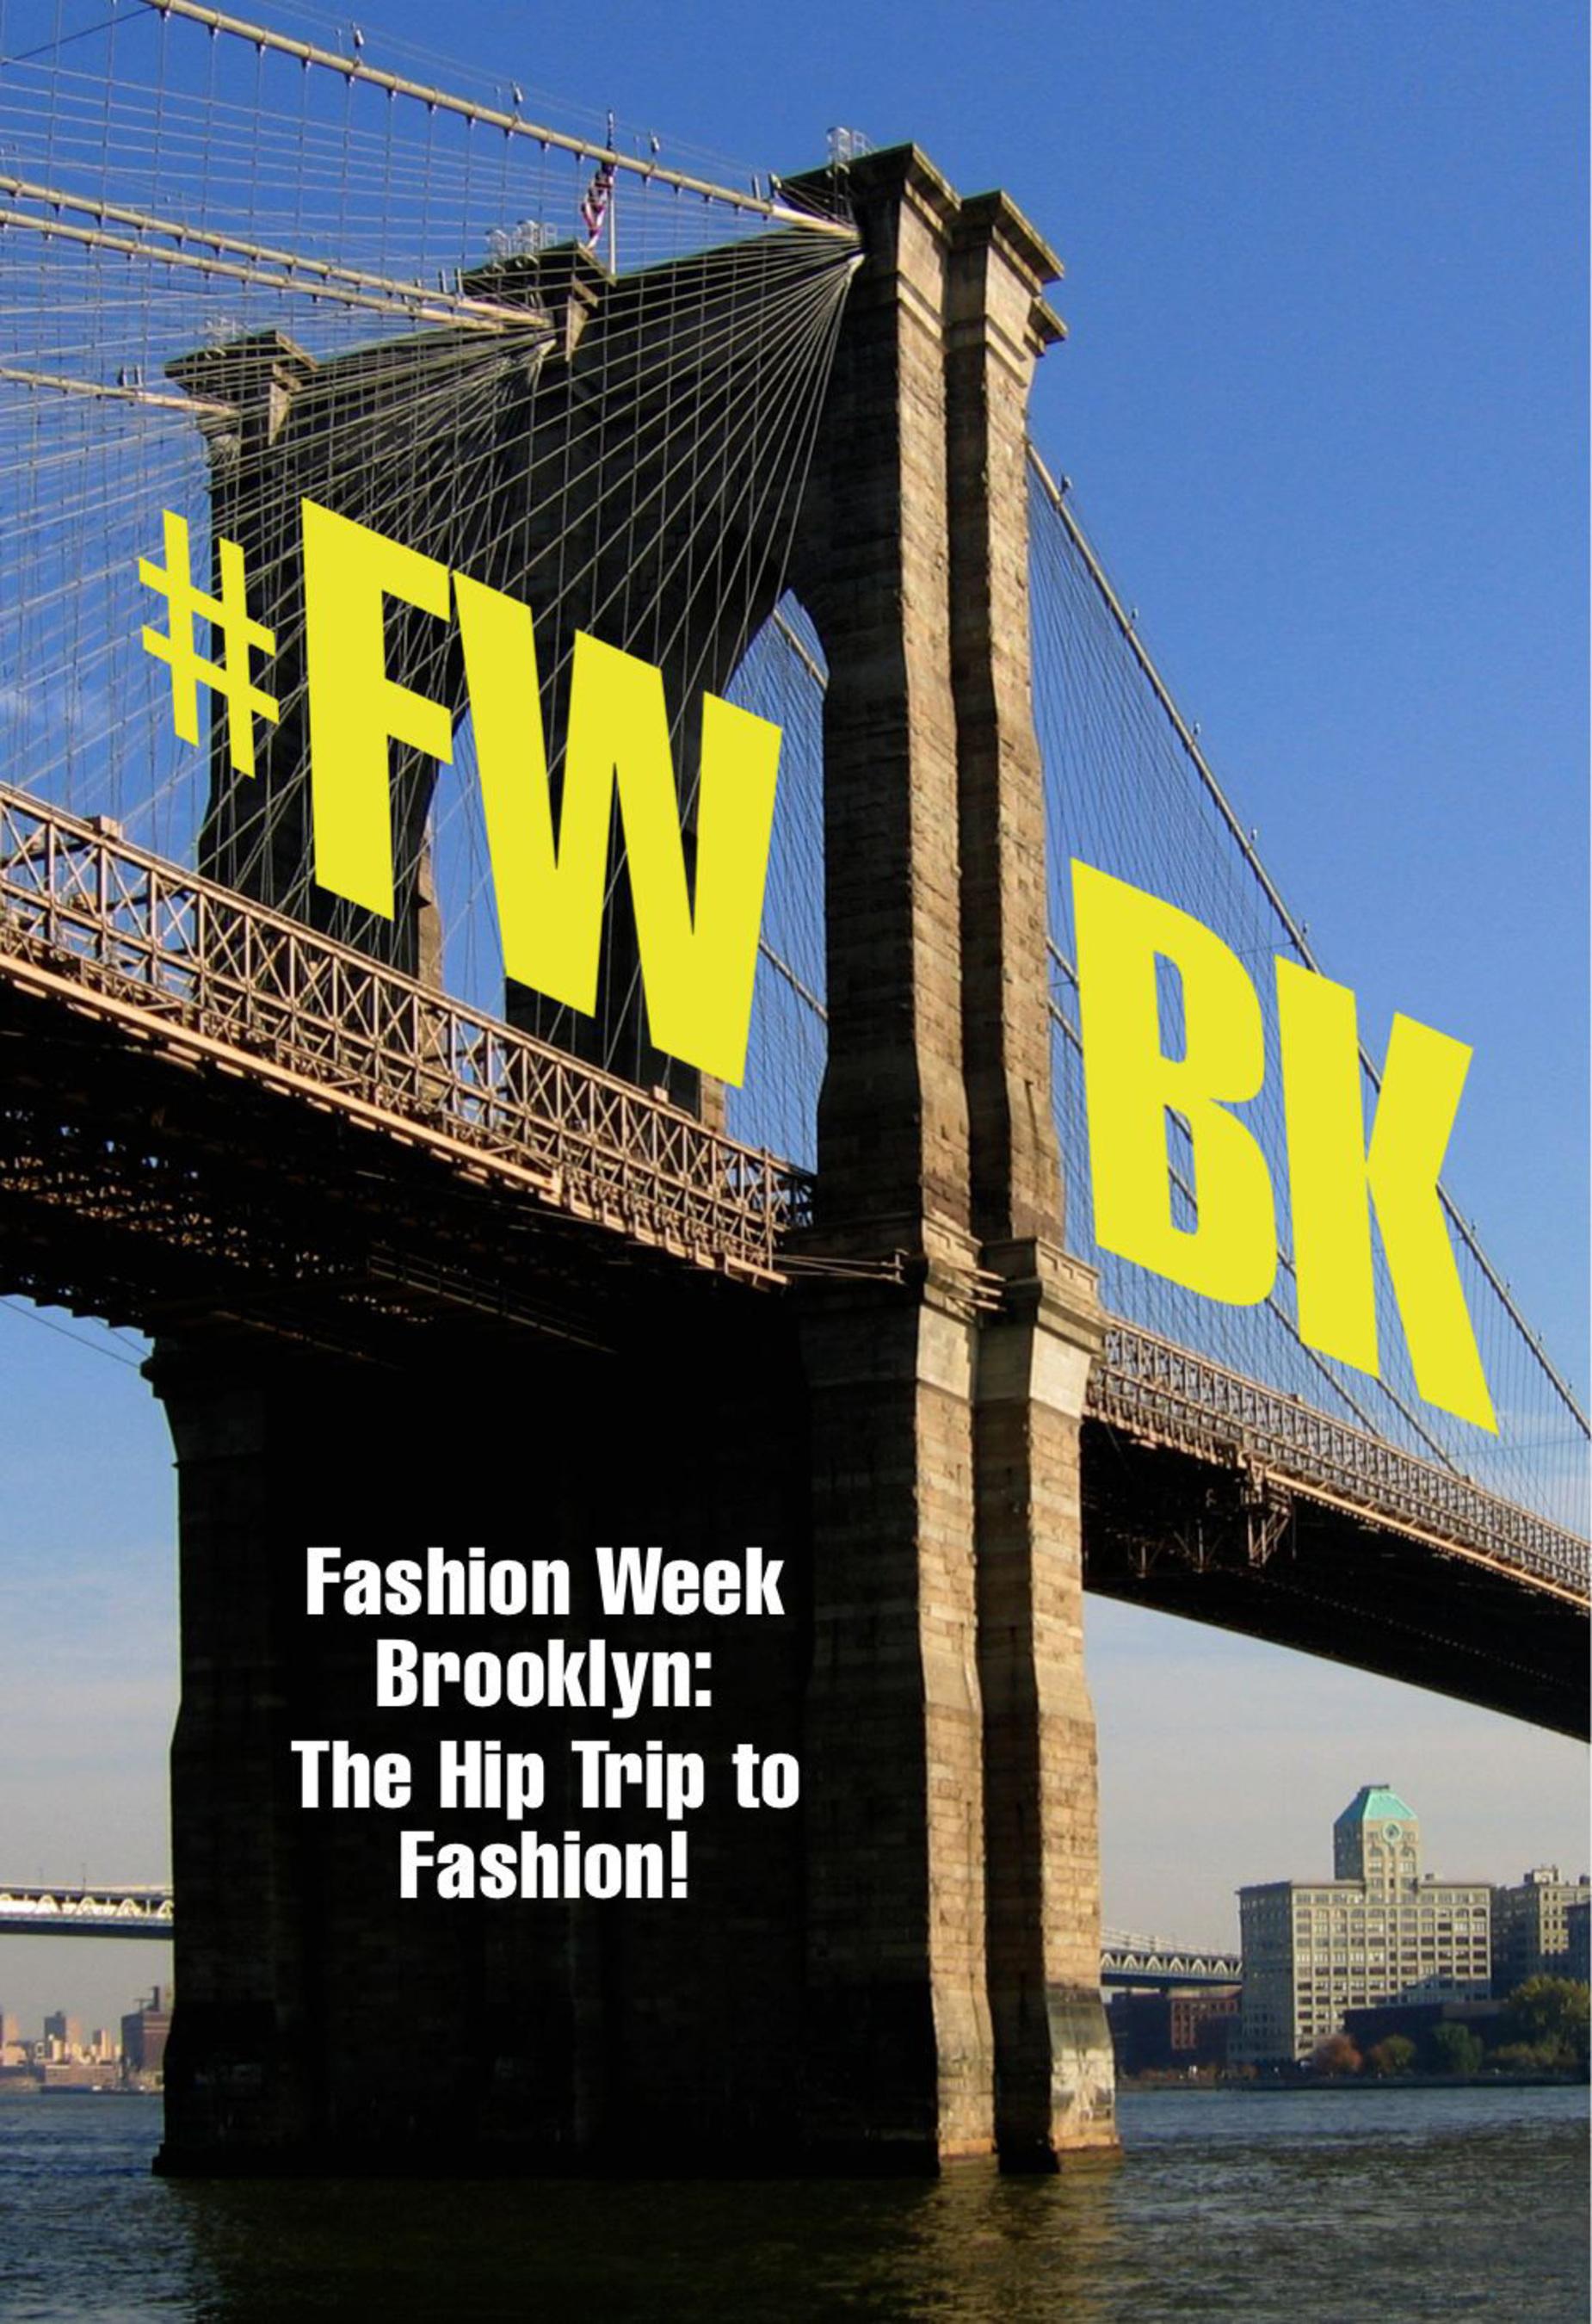 Fashion Week Brooklyn: The Hip Trip to Fashion!